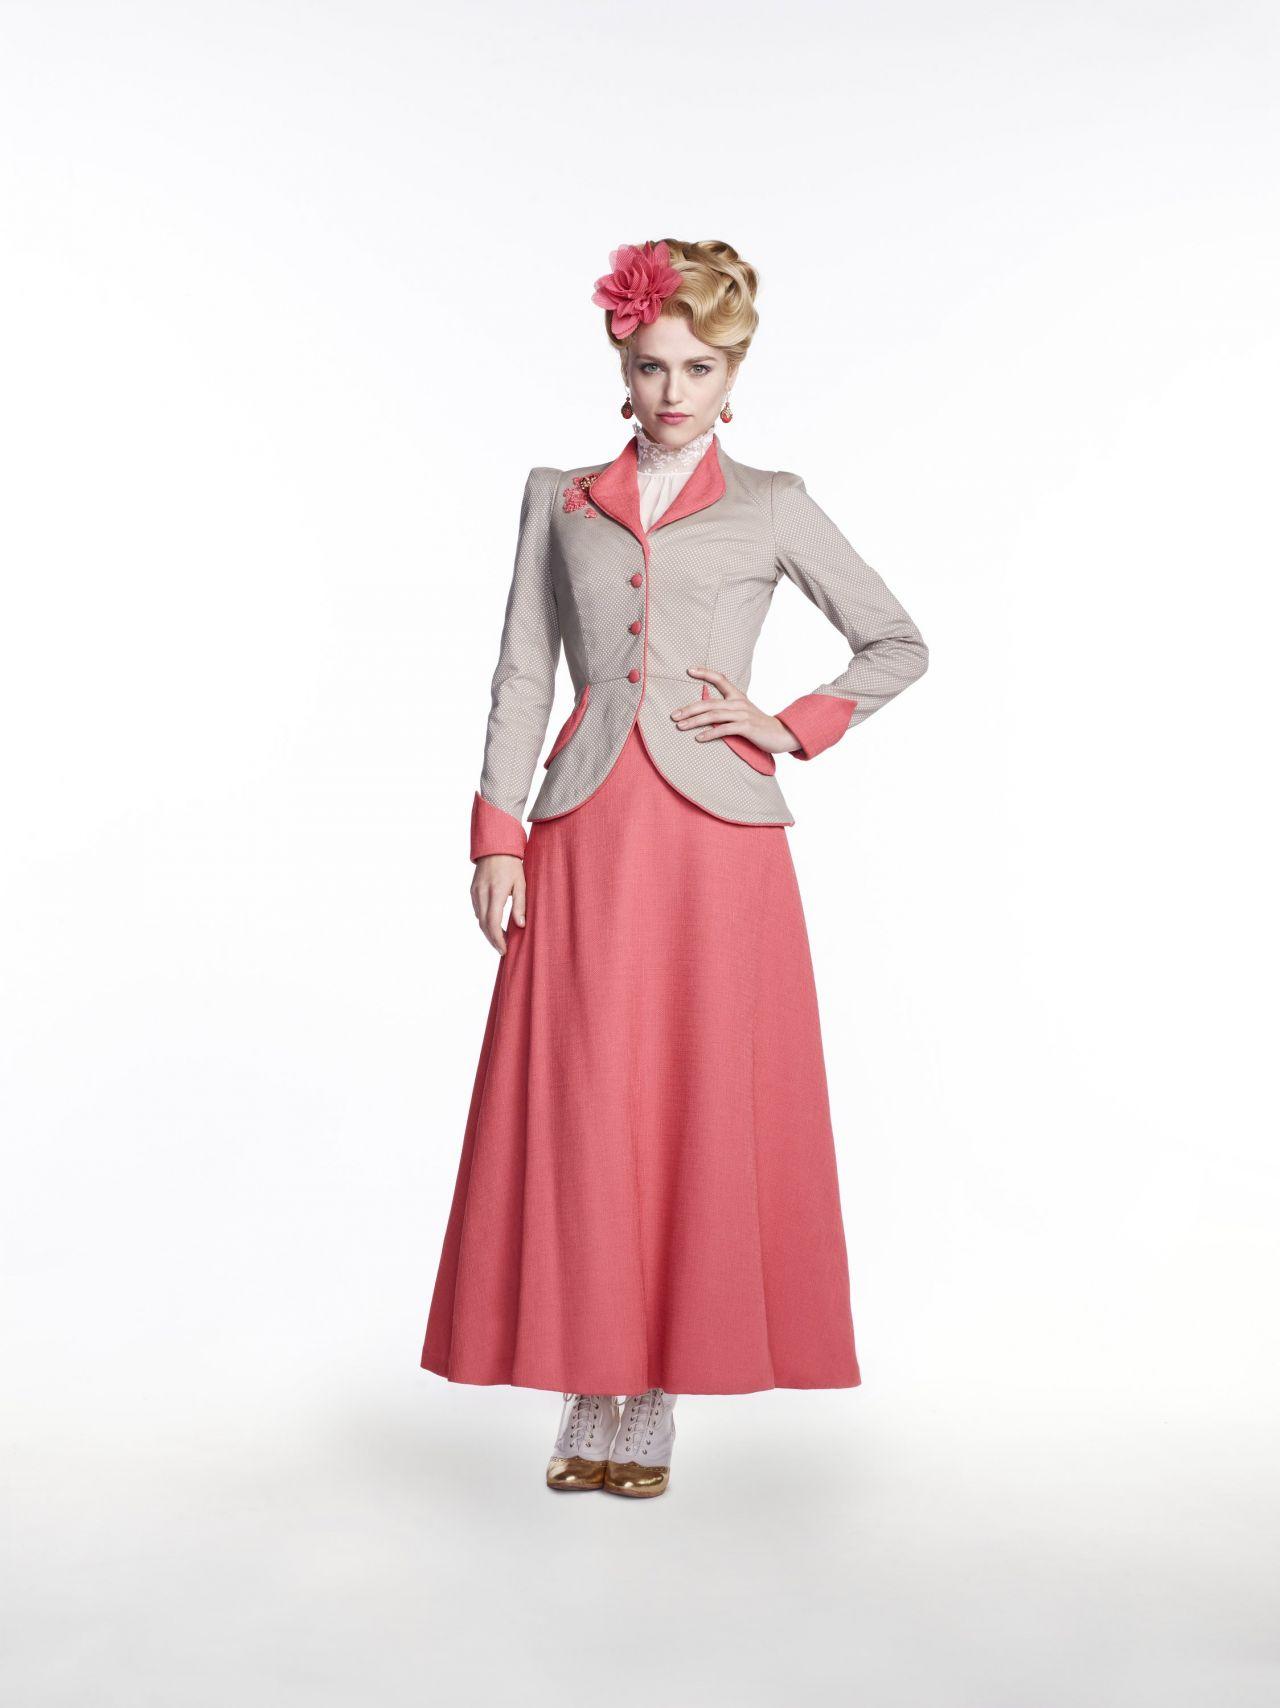 Jessica De Gouw Katie Mcgrath Victoria Smurfit Dracula Cast Promos Posters And Stills